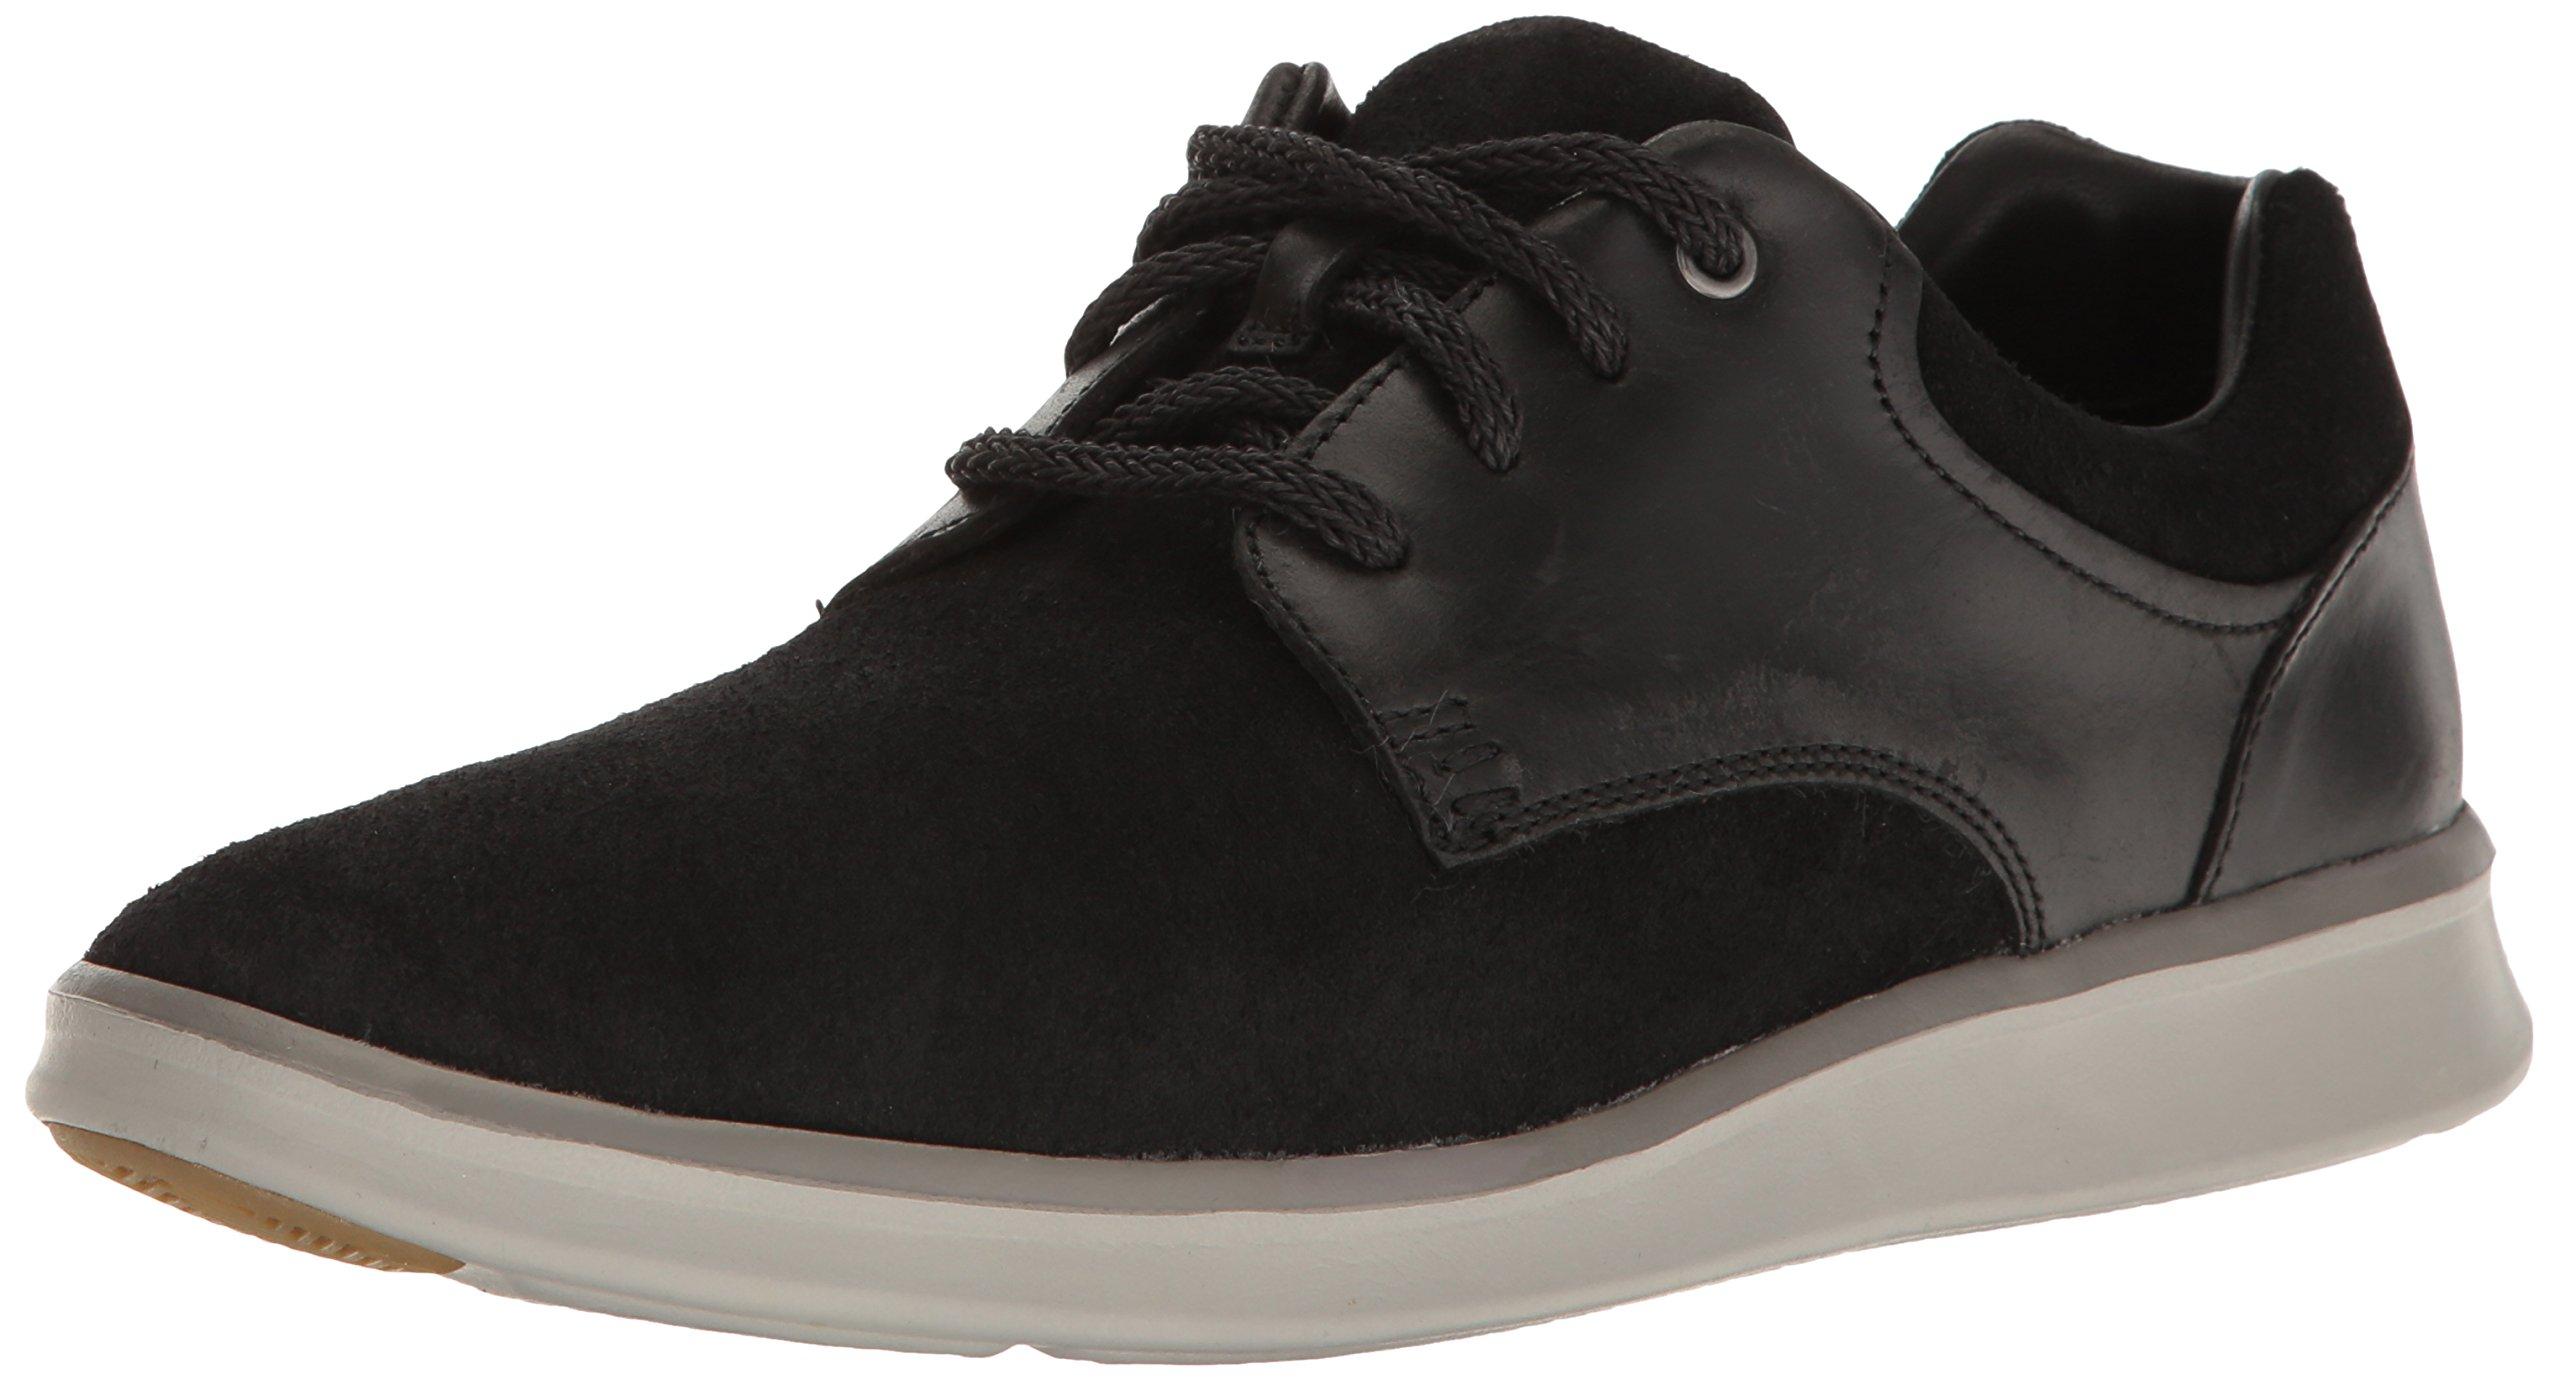 UGG Men's Hepner Fashion Sneaker, Black, 12 M US